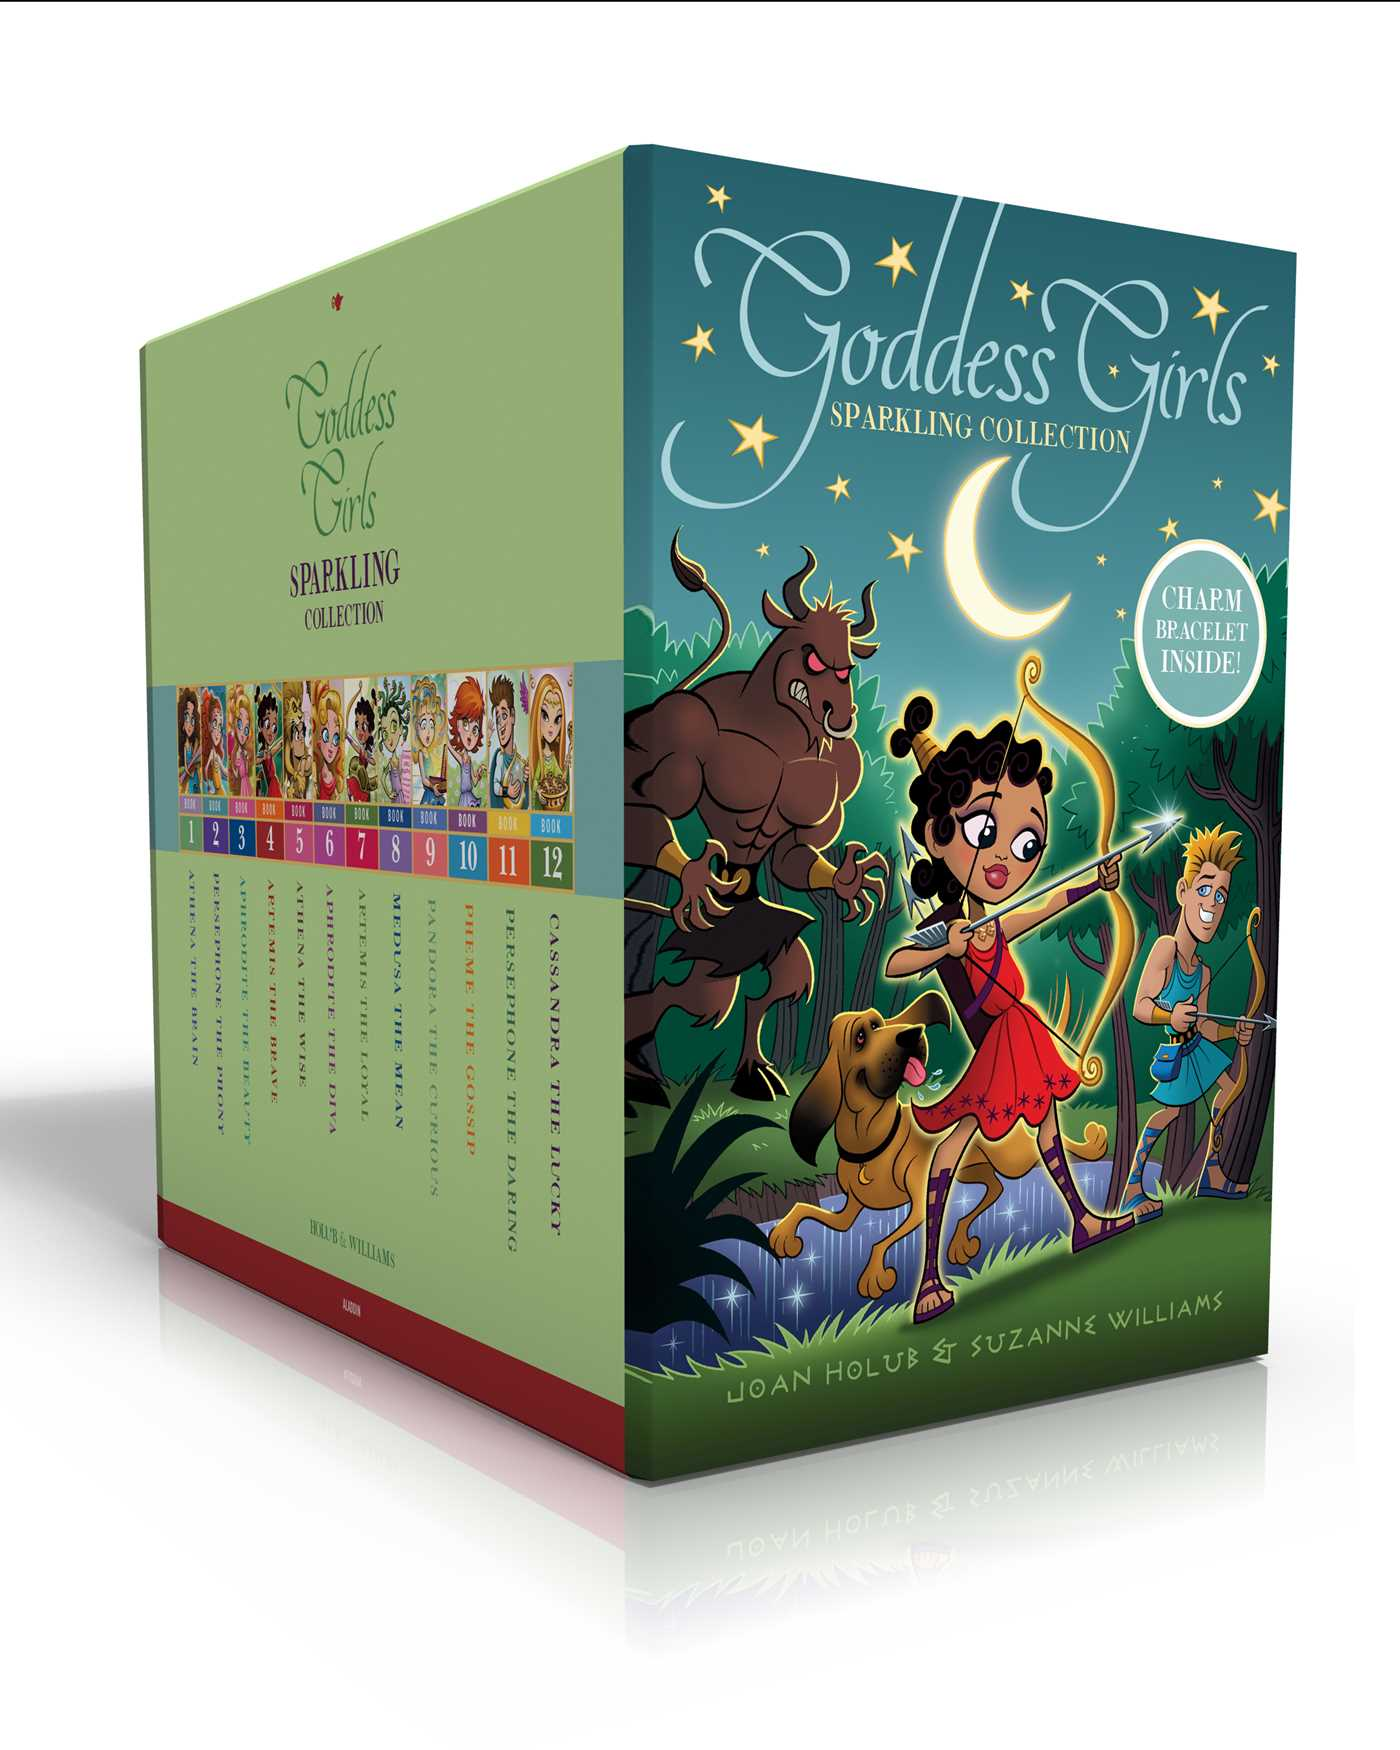 Goddess Girls Sparkling Collection (Charm Bracelet Inside